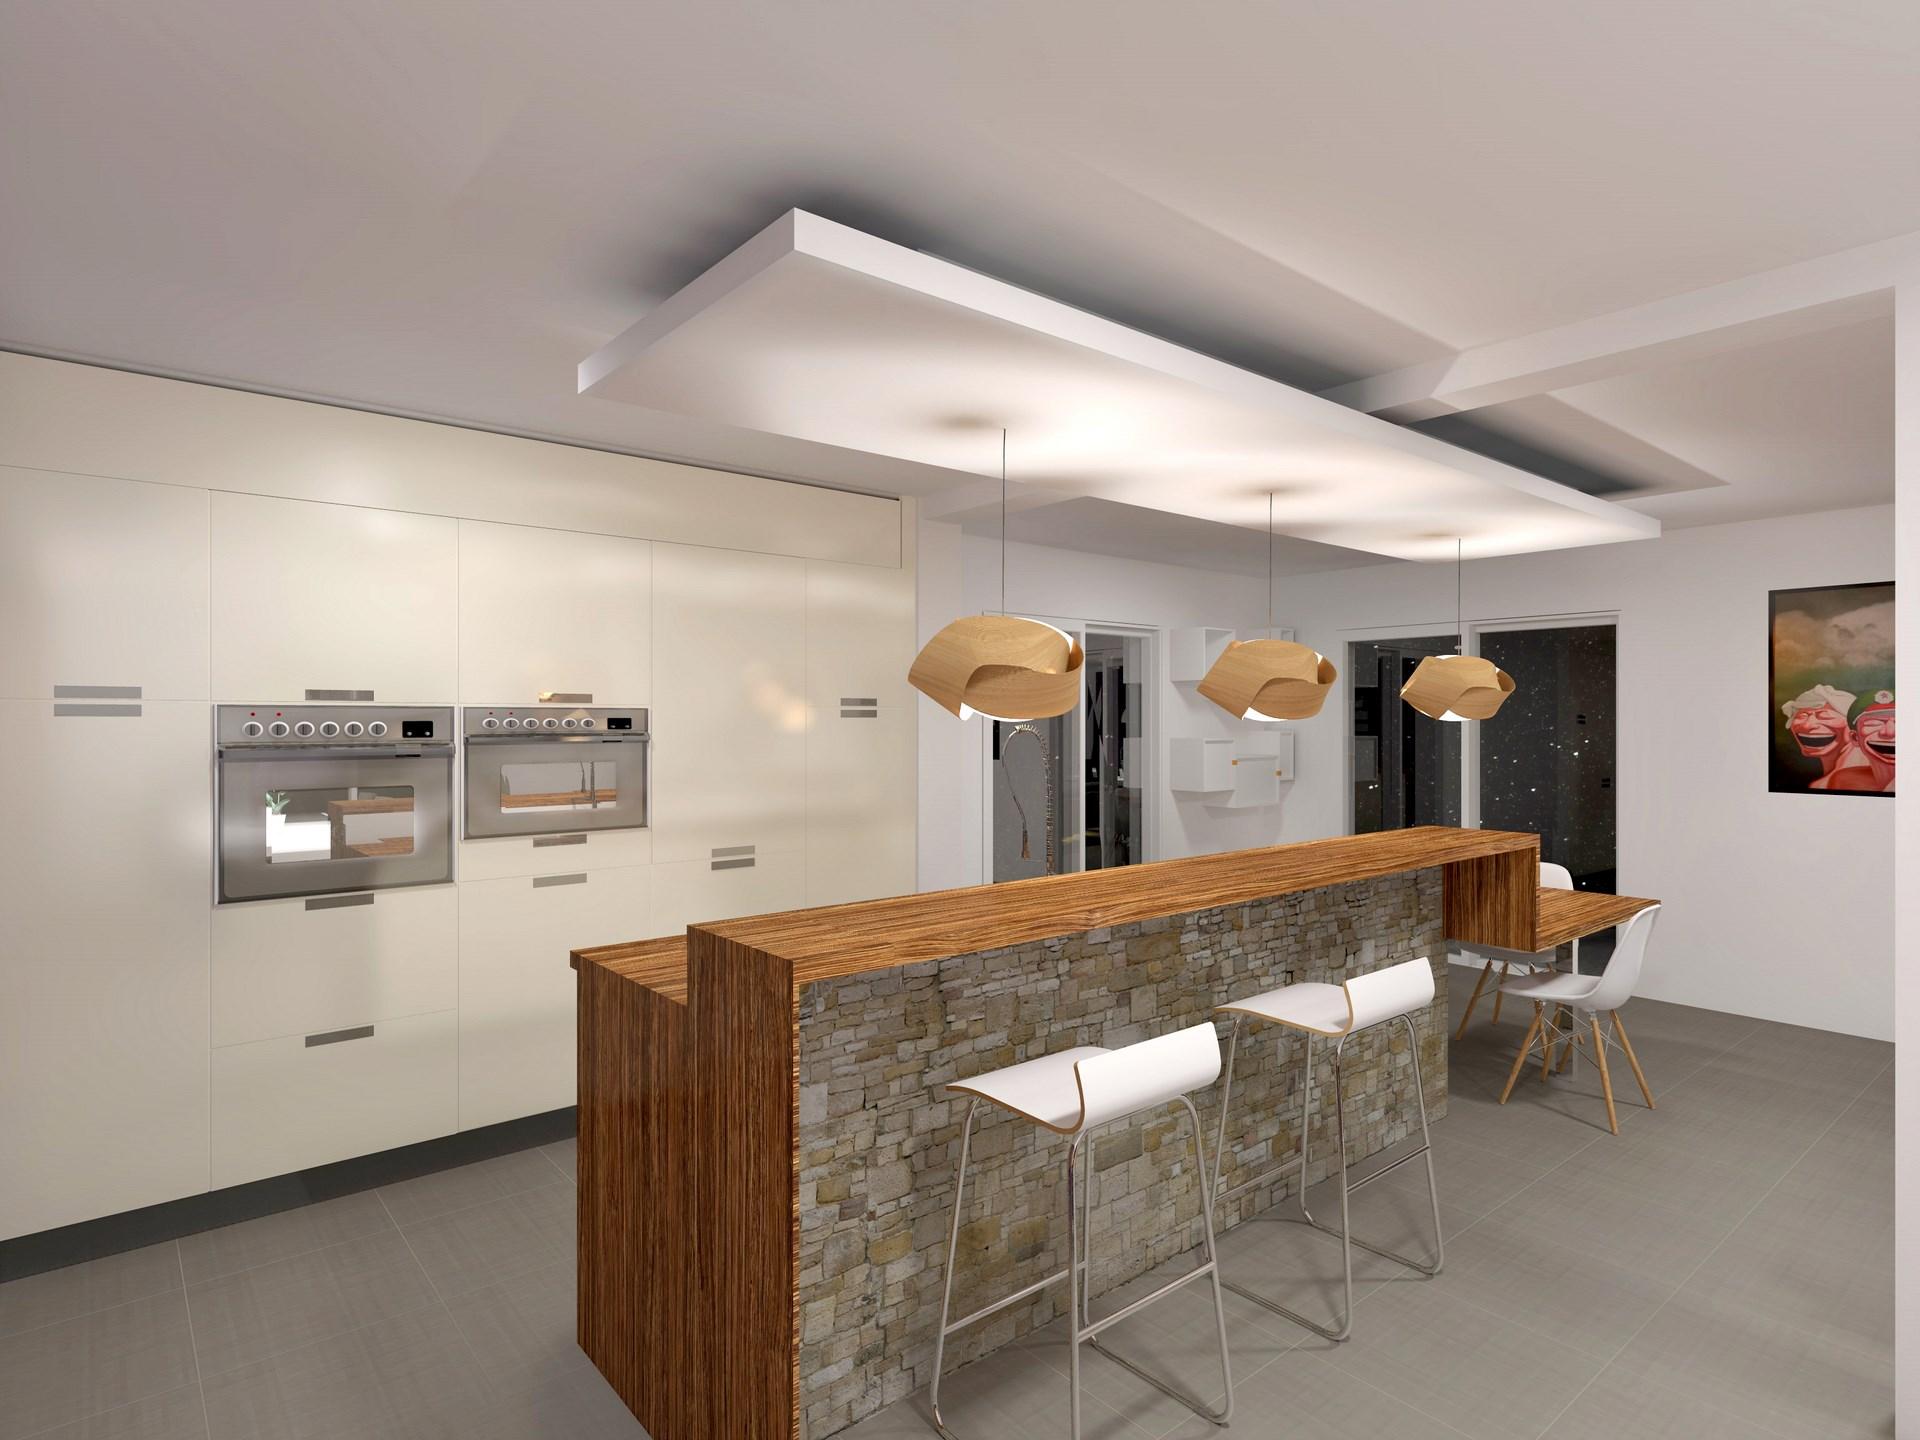 Plafond suspendu cuisine isolation id es - Isolation phonique plafond suspendu ...